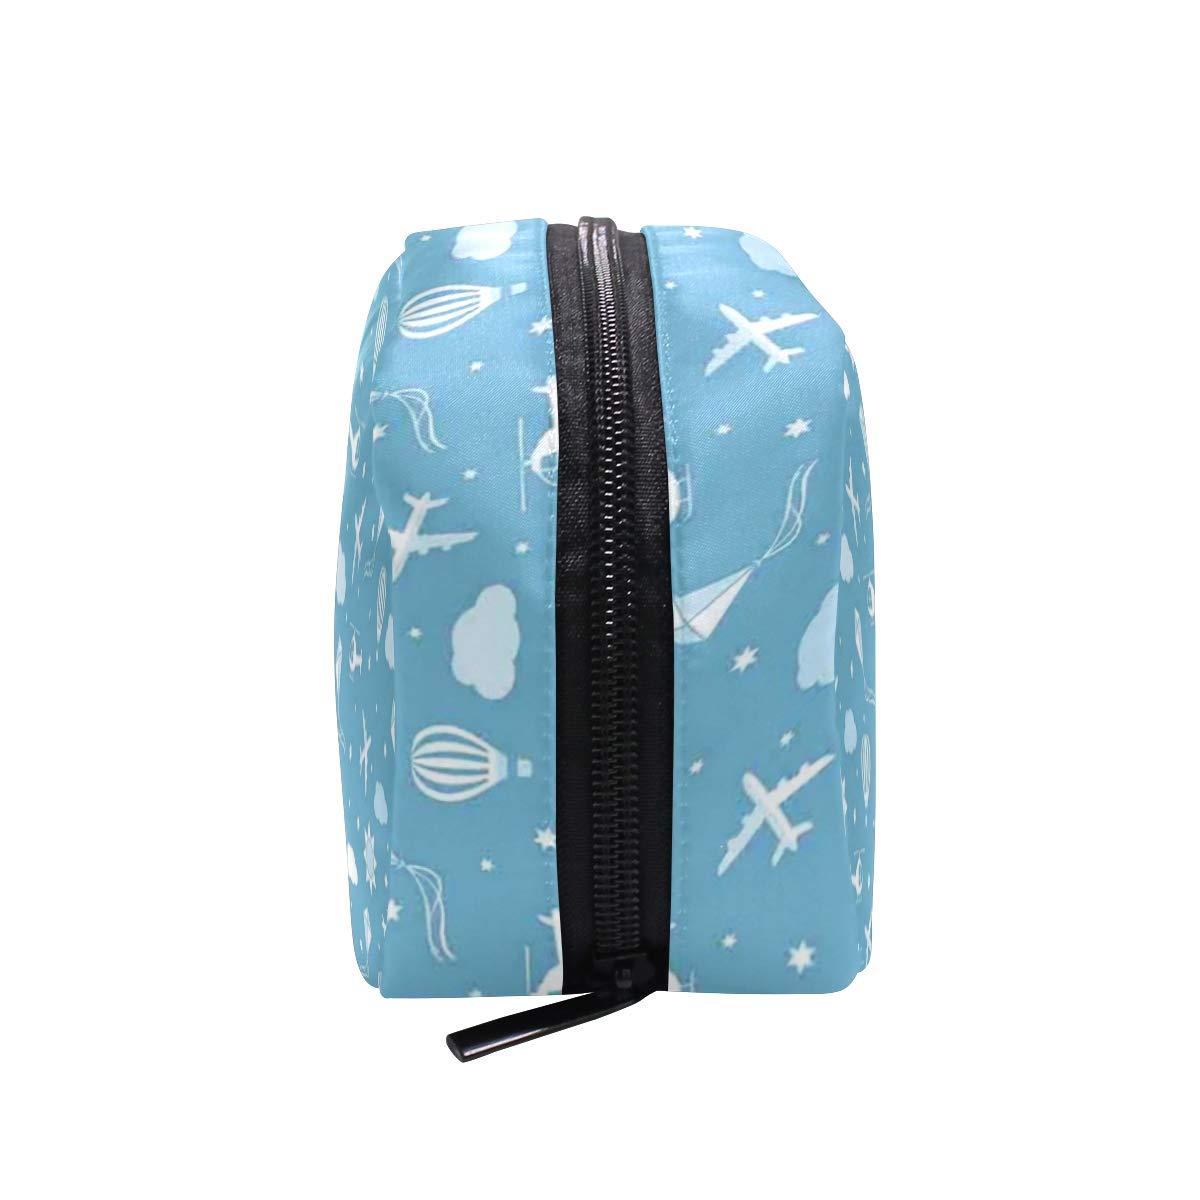 9c930339514a Amazon.com : Jacksome Nursery Cosmetic Bag Makeup Bag Travel for ...